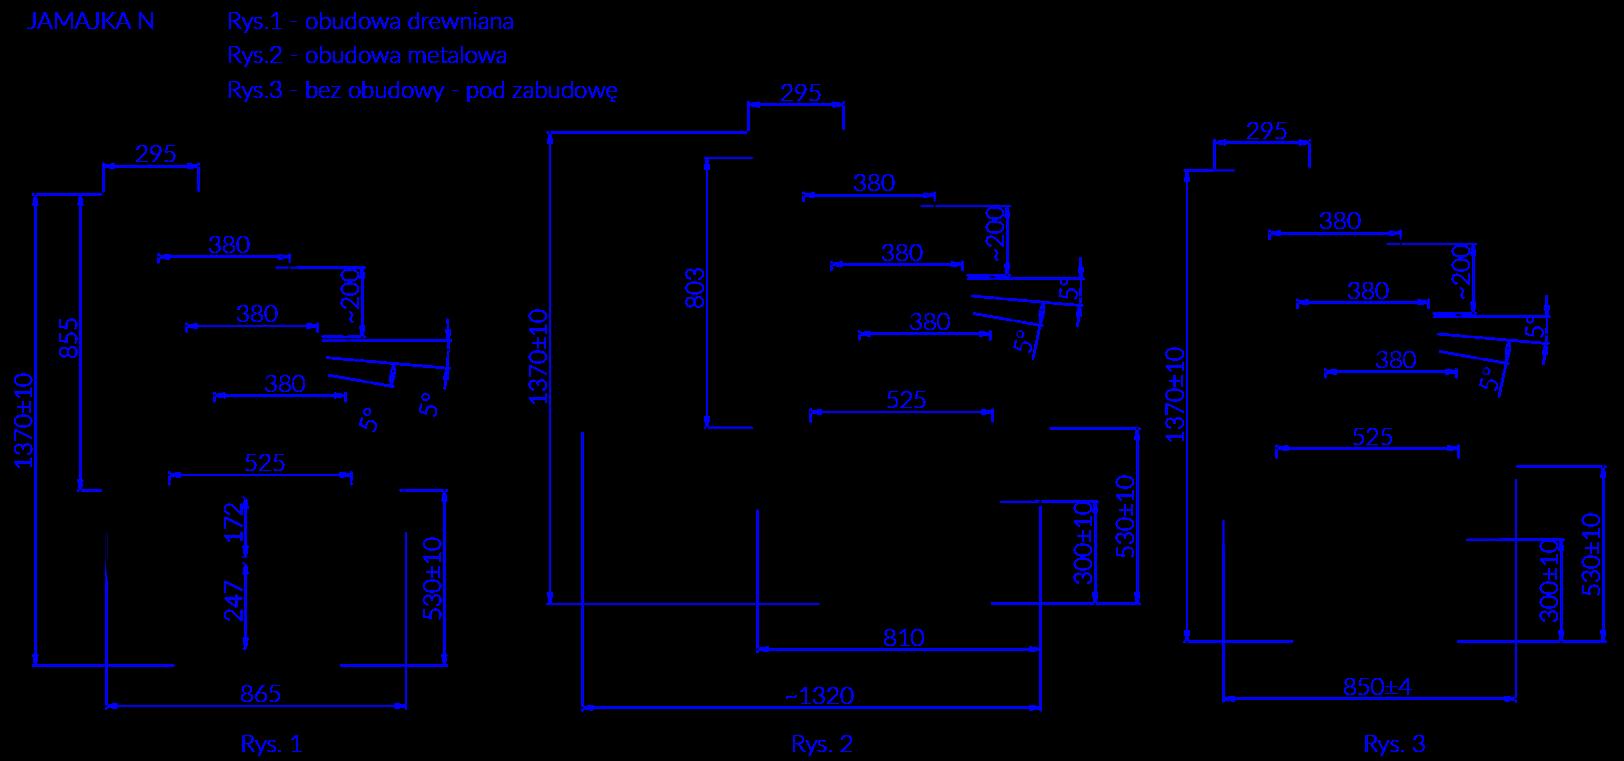 Technical drawing JAMAJKA N MOD